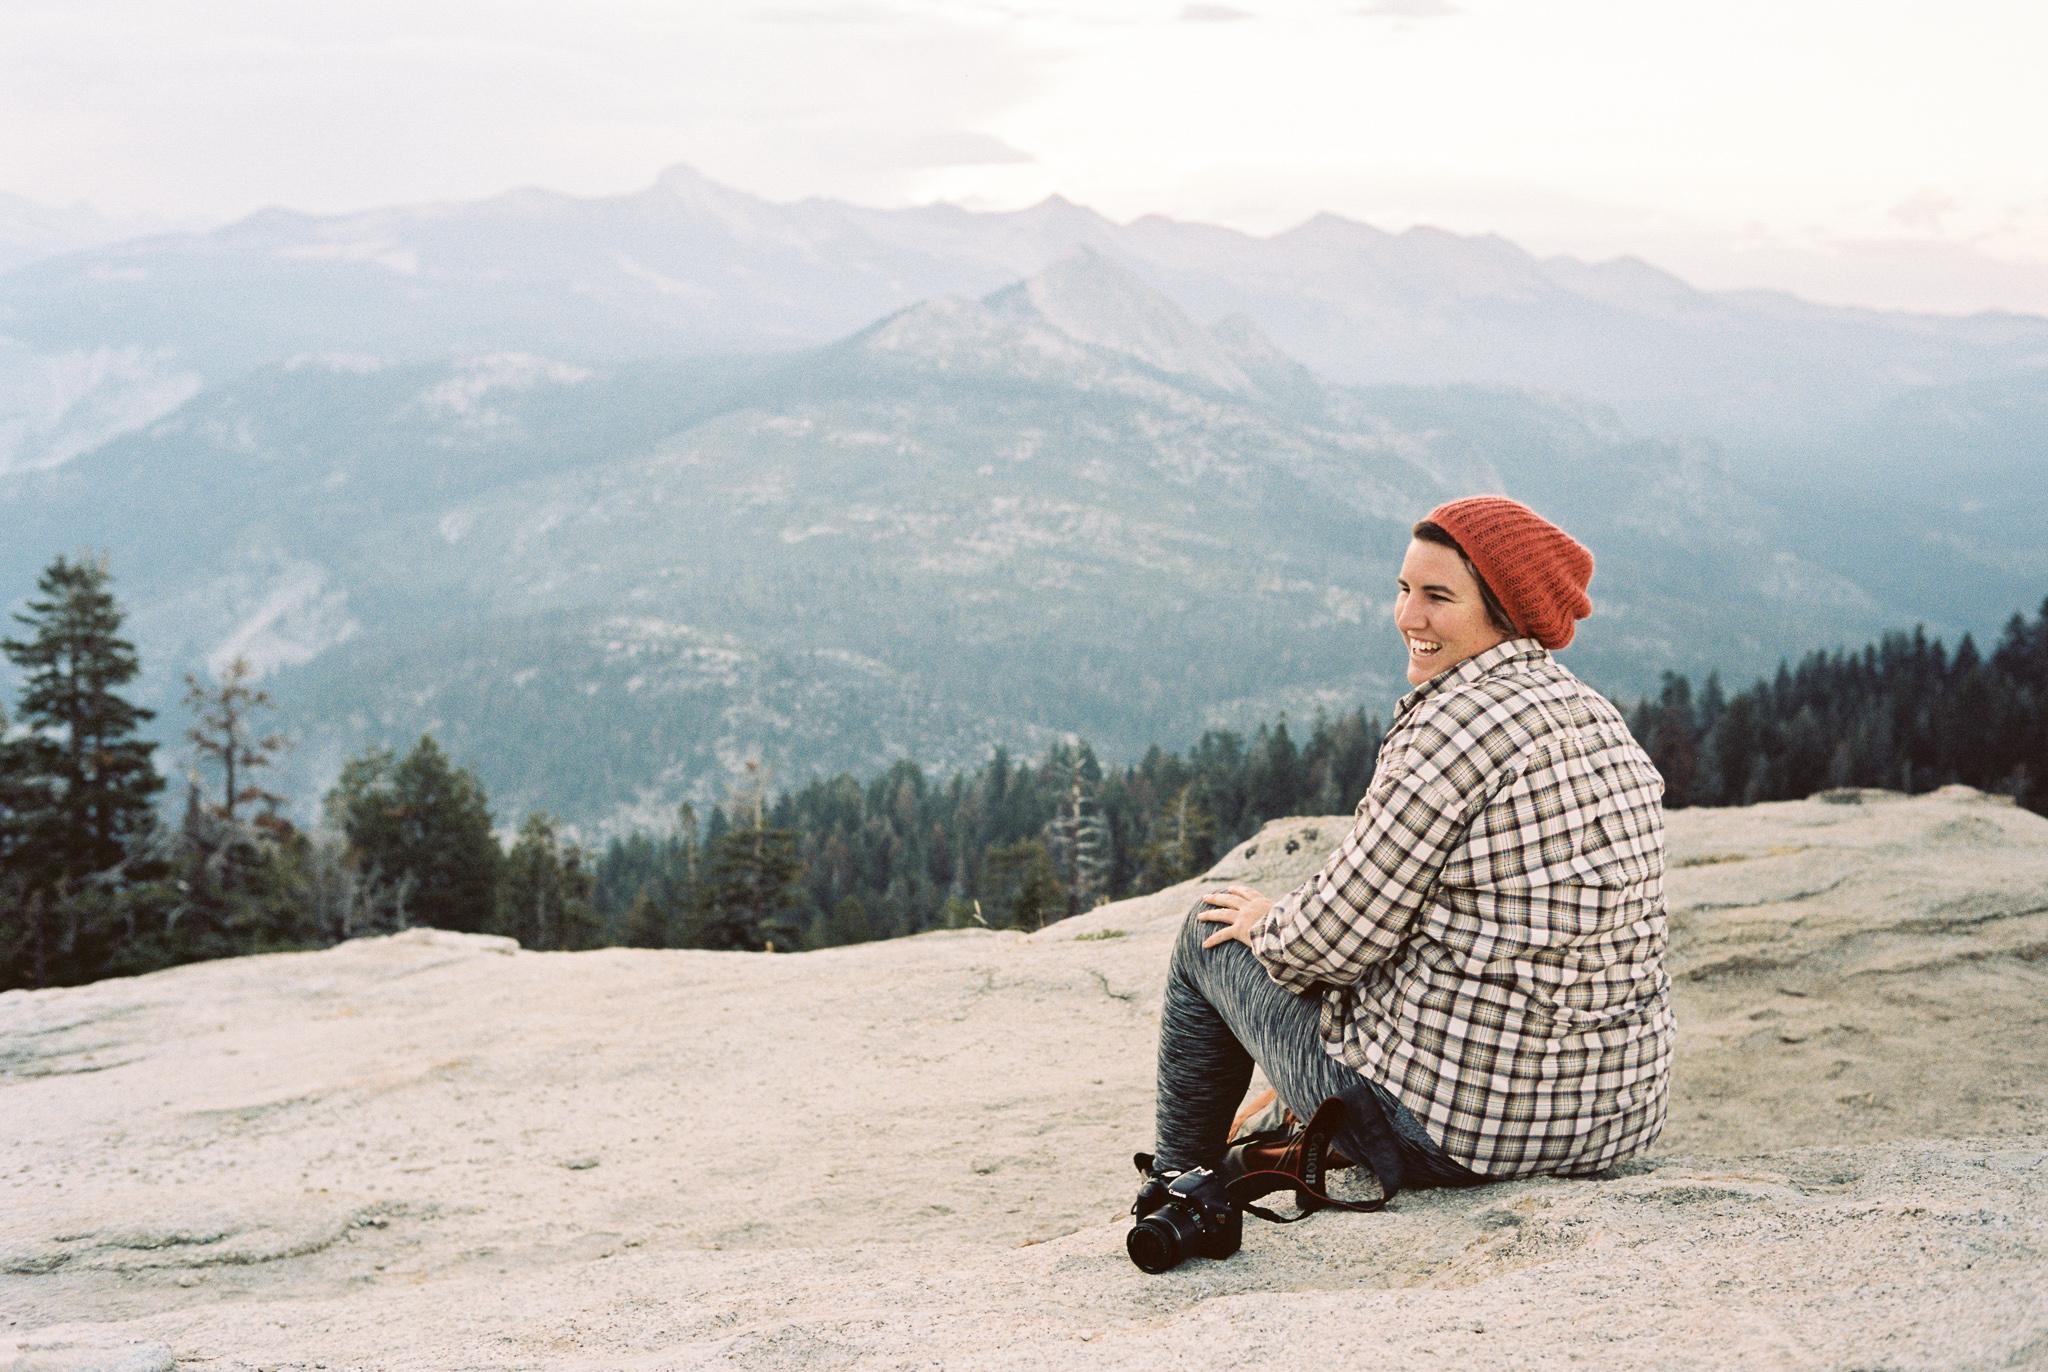 20160821-Film-Yosemite-24-2.jpg